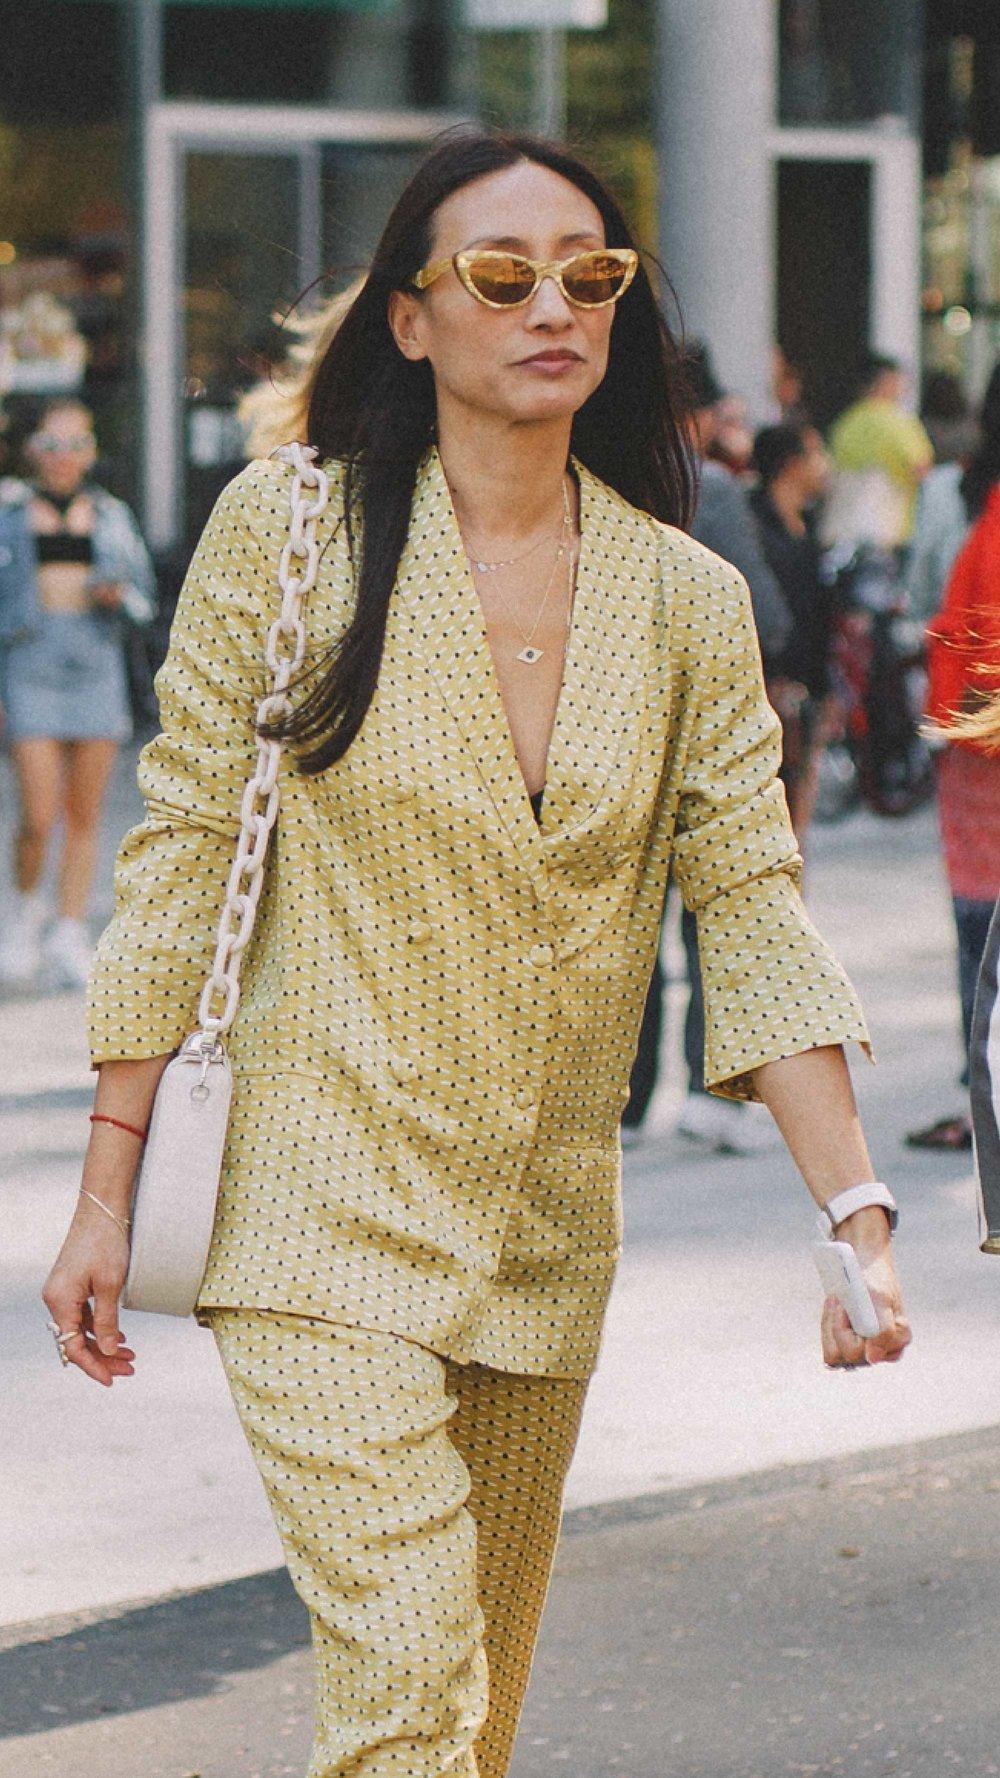 London Fashion Week Street Style Day 3 SS19 -15.jpg